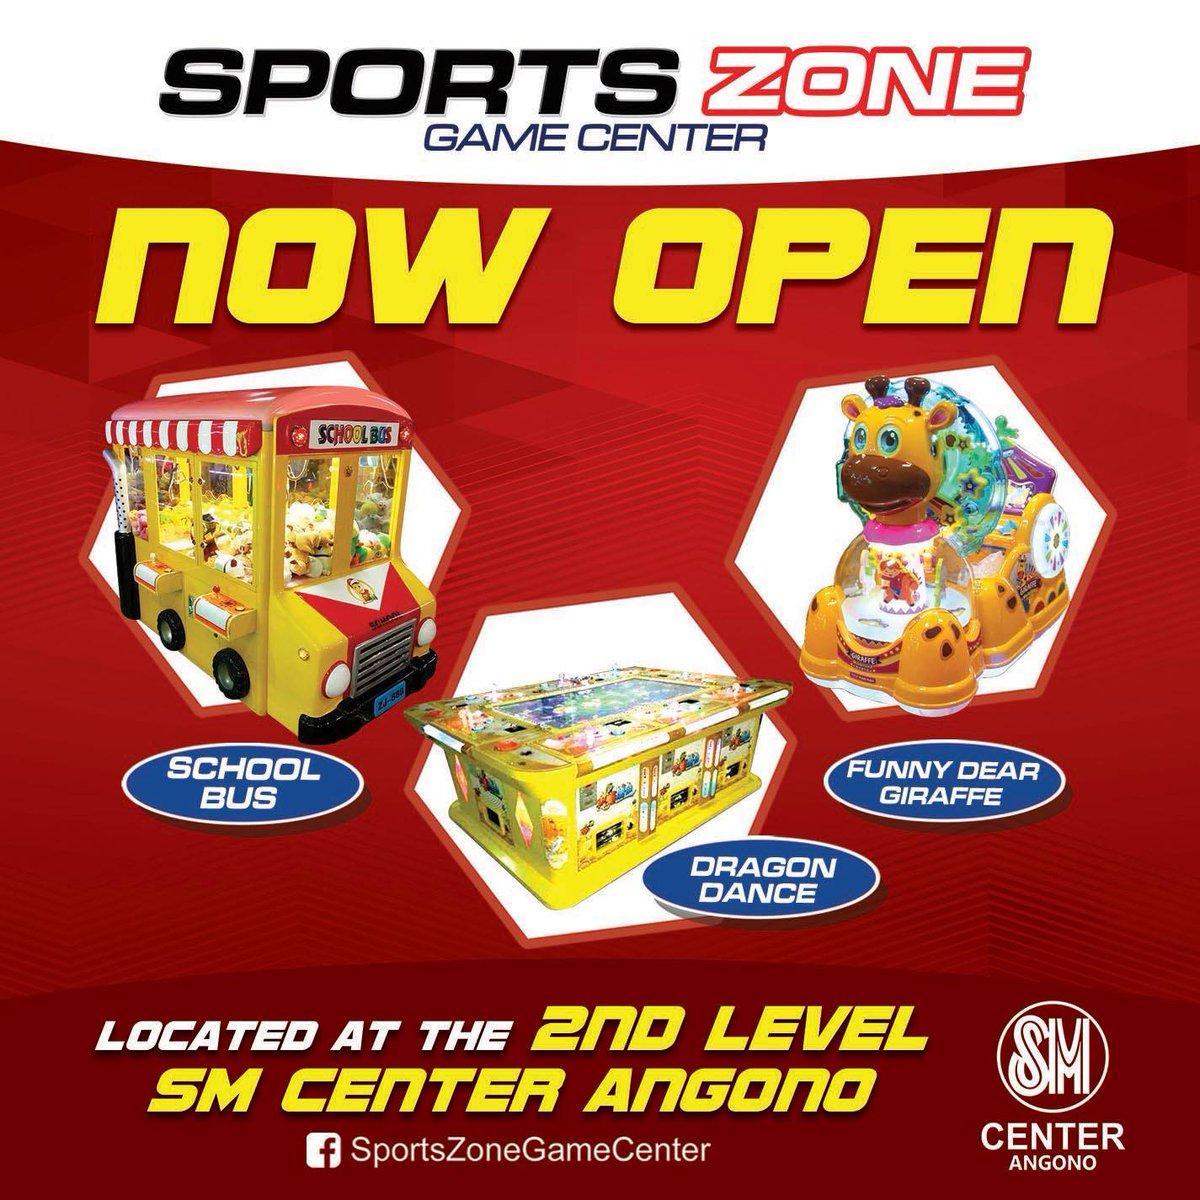 SportsZoneGameCenter hashtag on Twitter